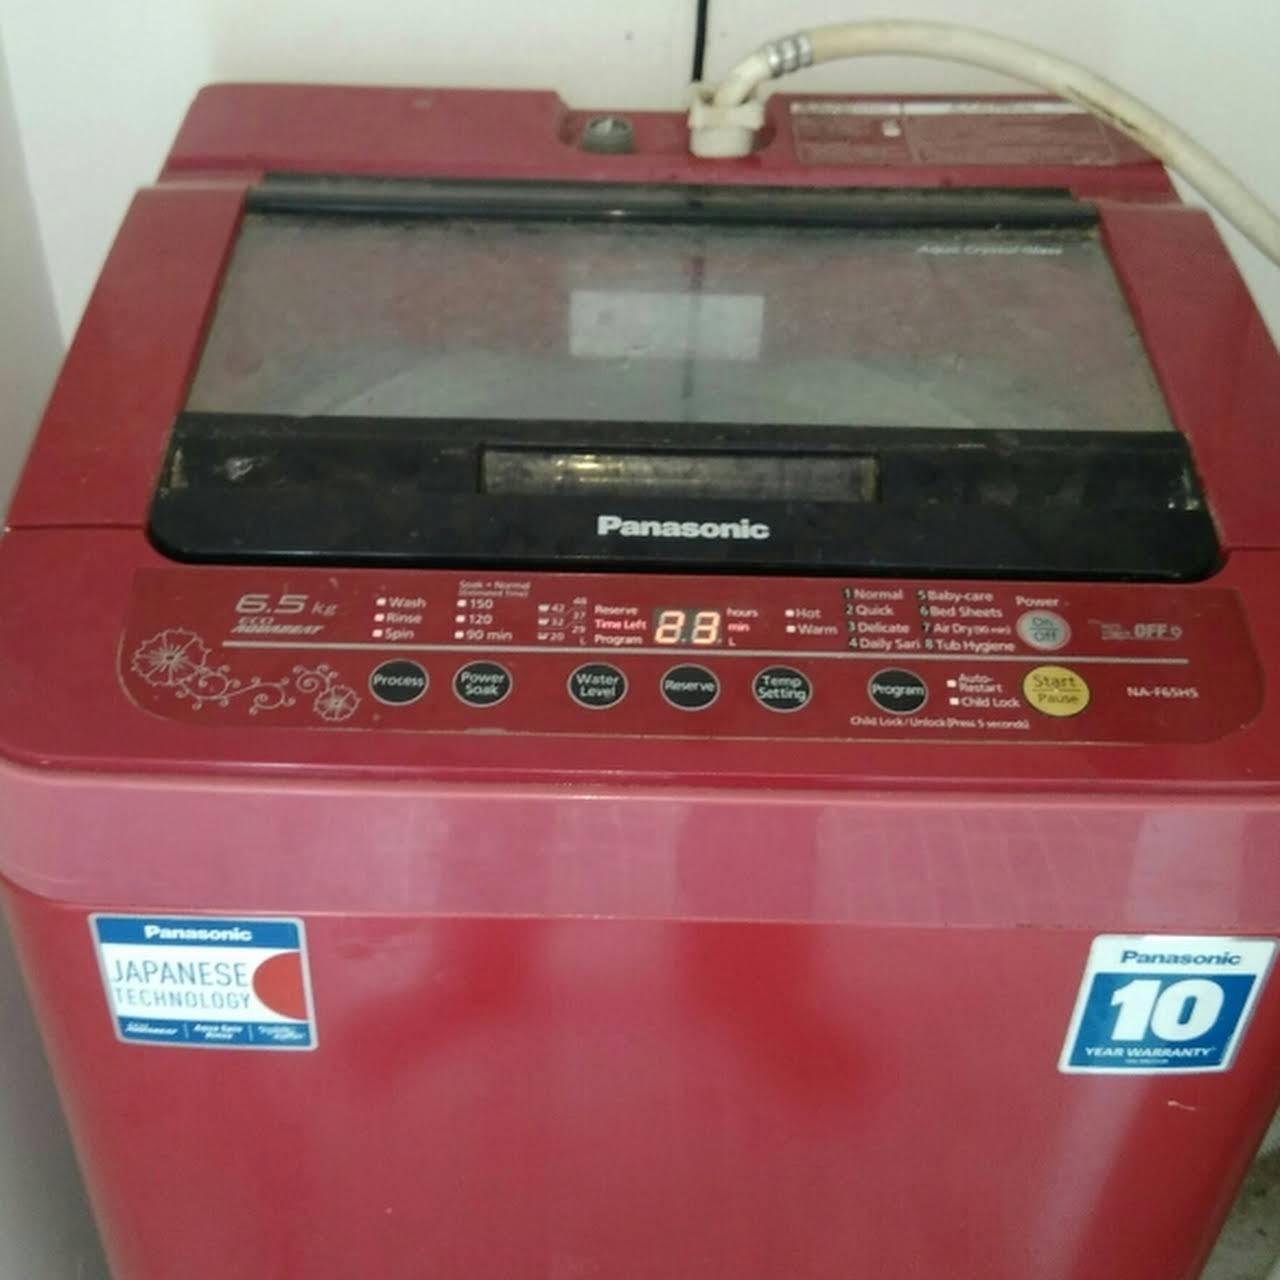 Panasonic Fridge Service Washing Machine Wiring Diagram Posted On 3 Nov 2018